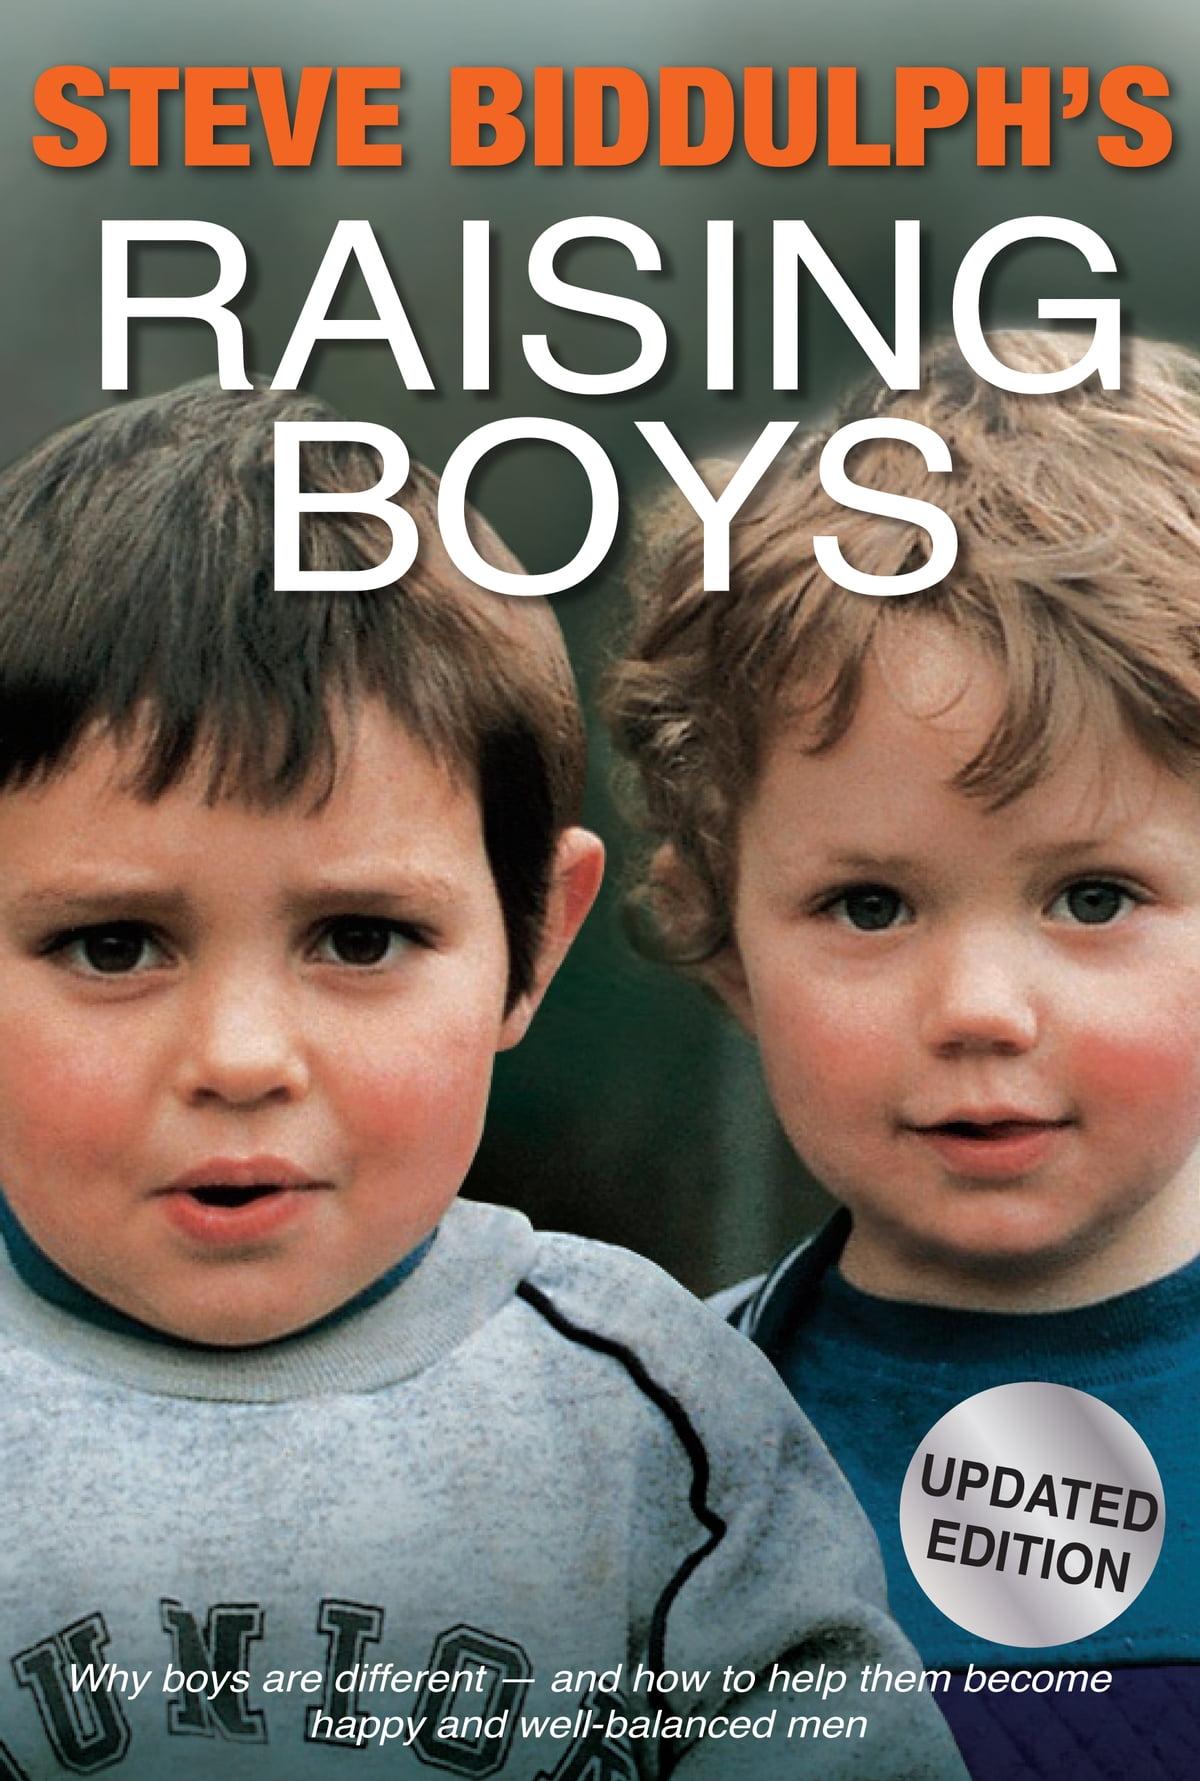 raising boys in the 21st century steve bidduph ebook download